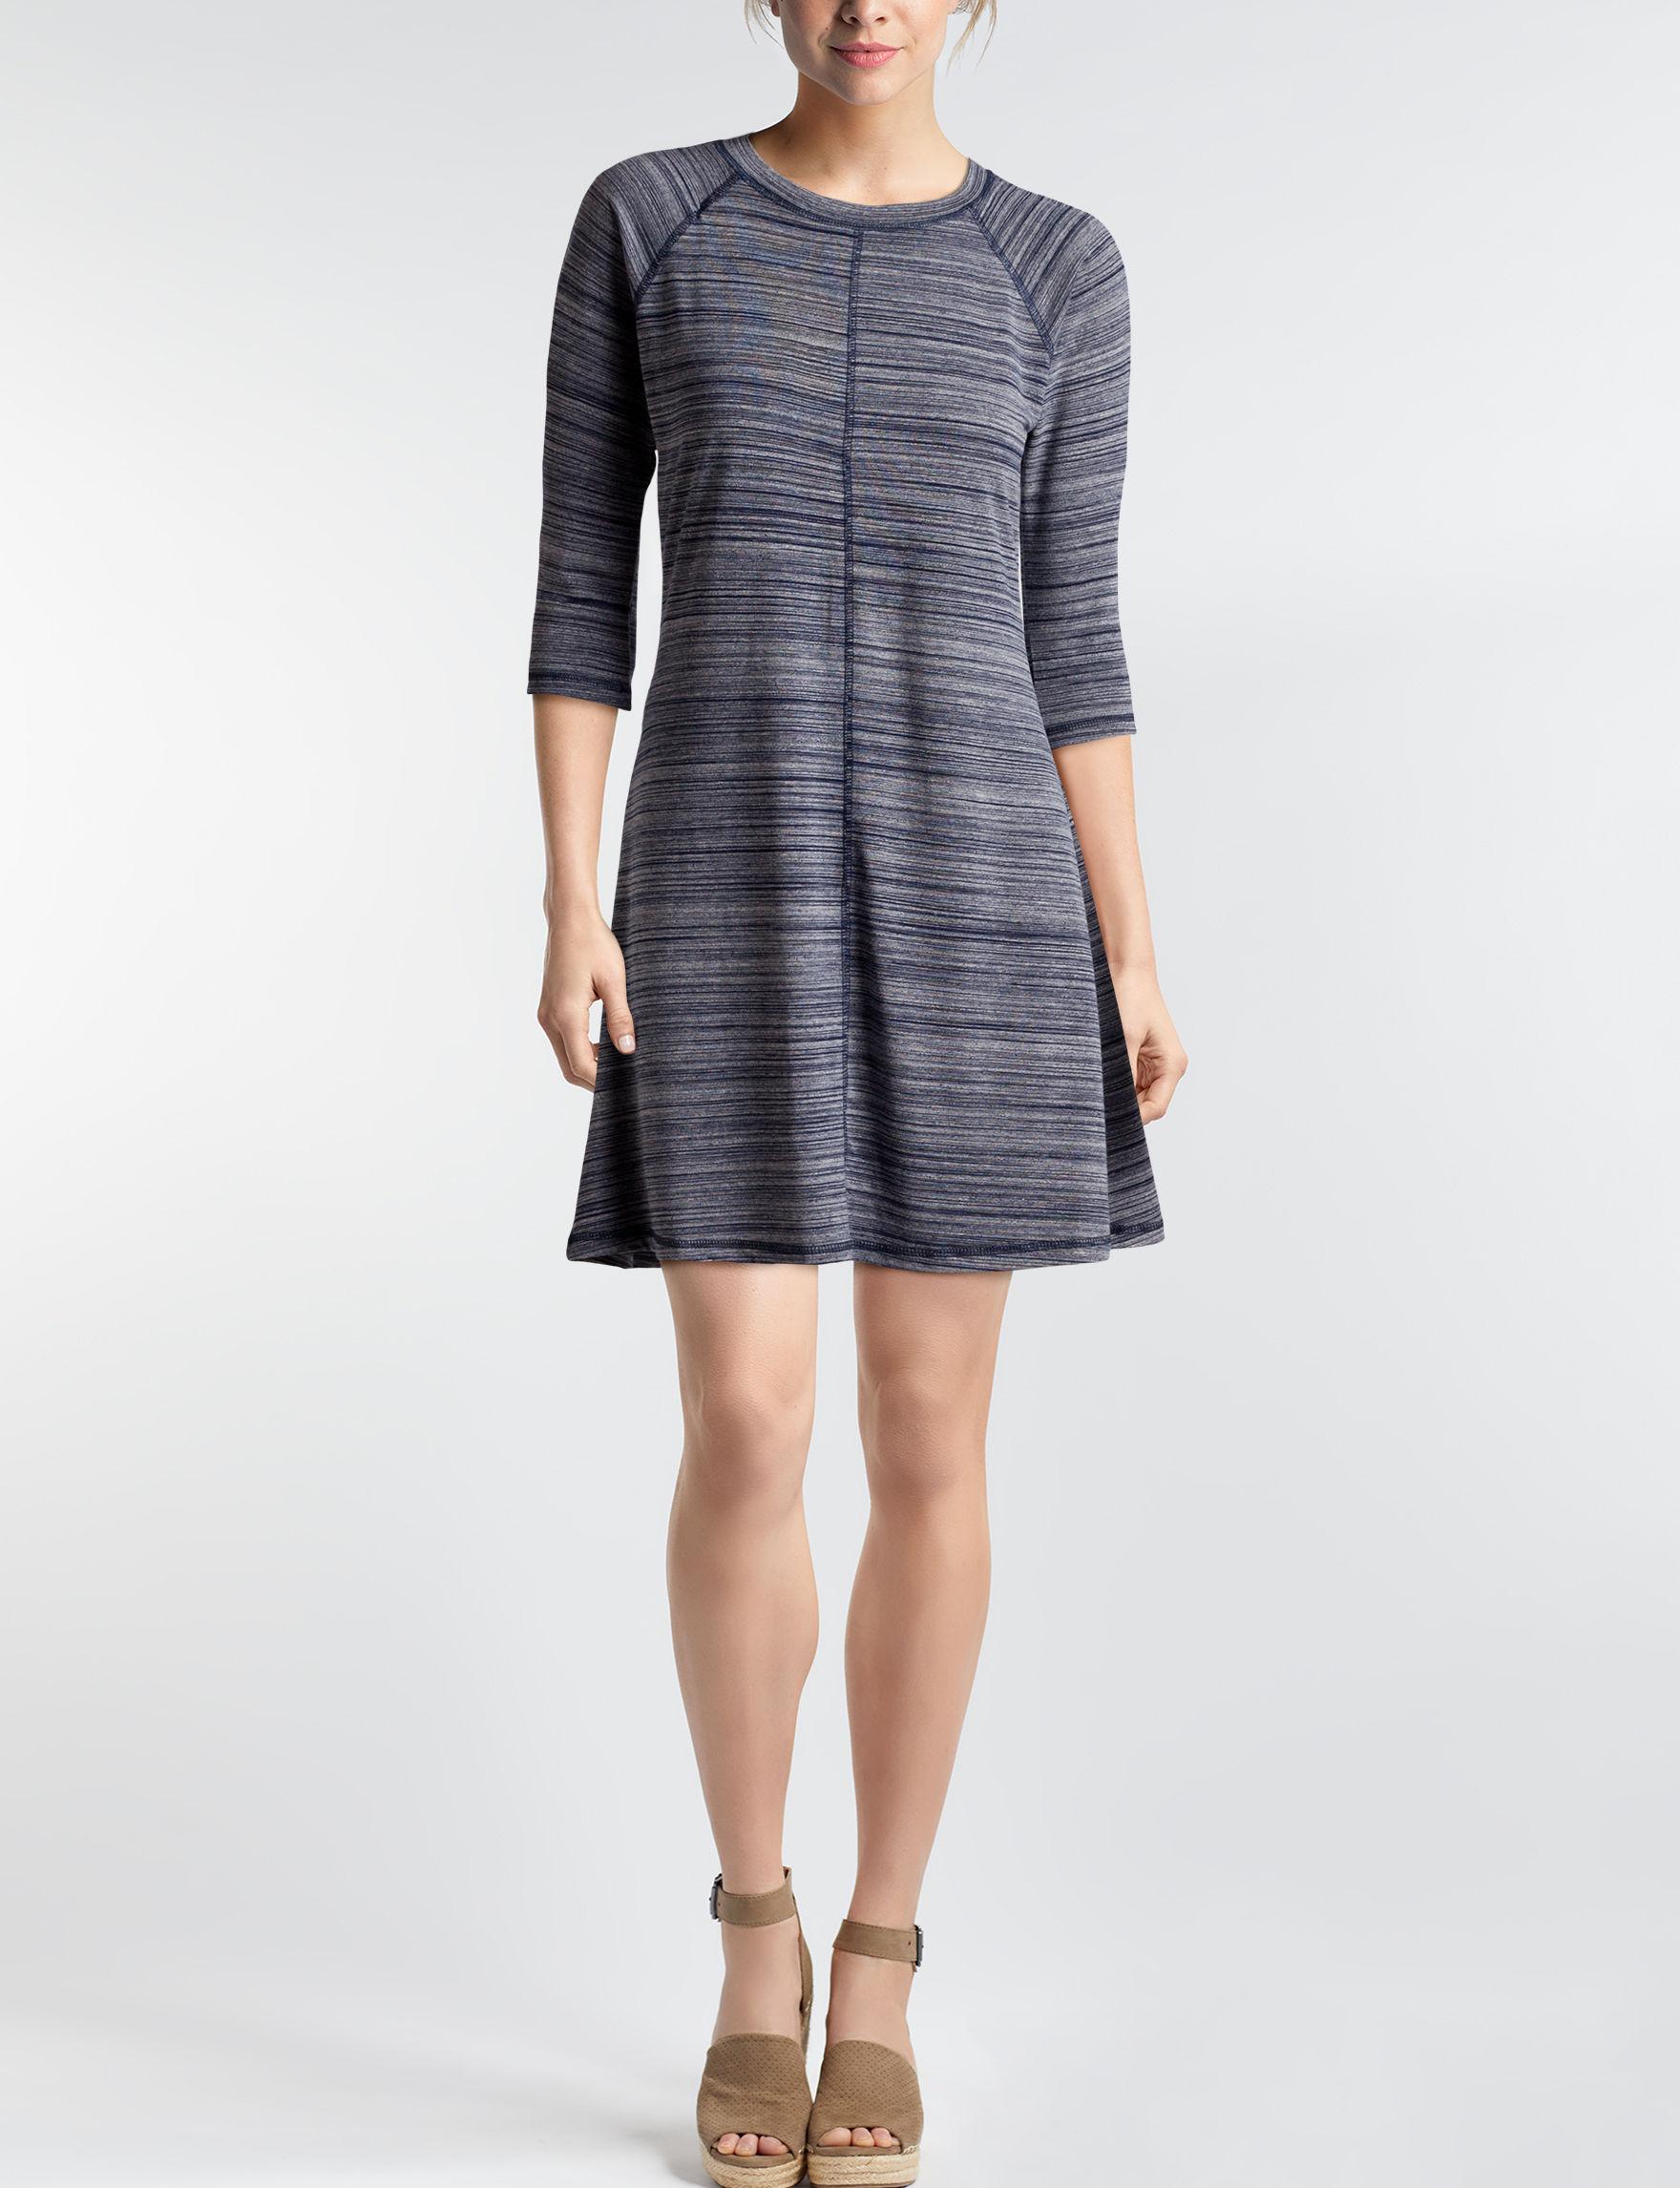 BeBop Navy Everyday & Casual Sheath Dresses